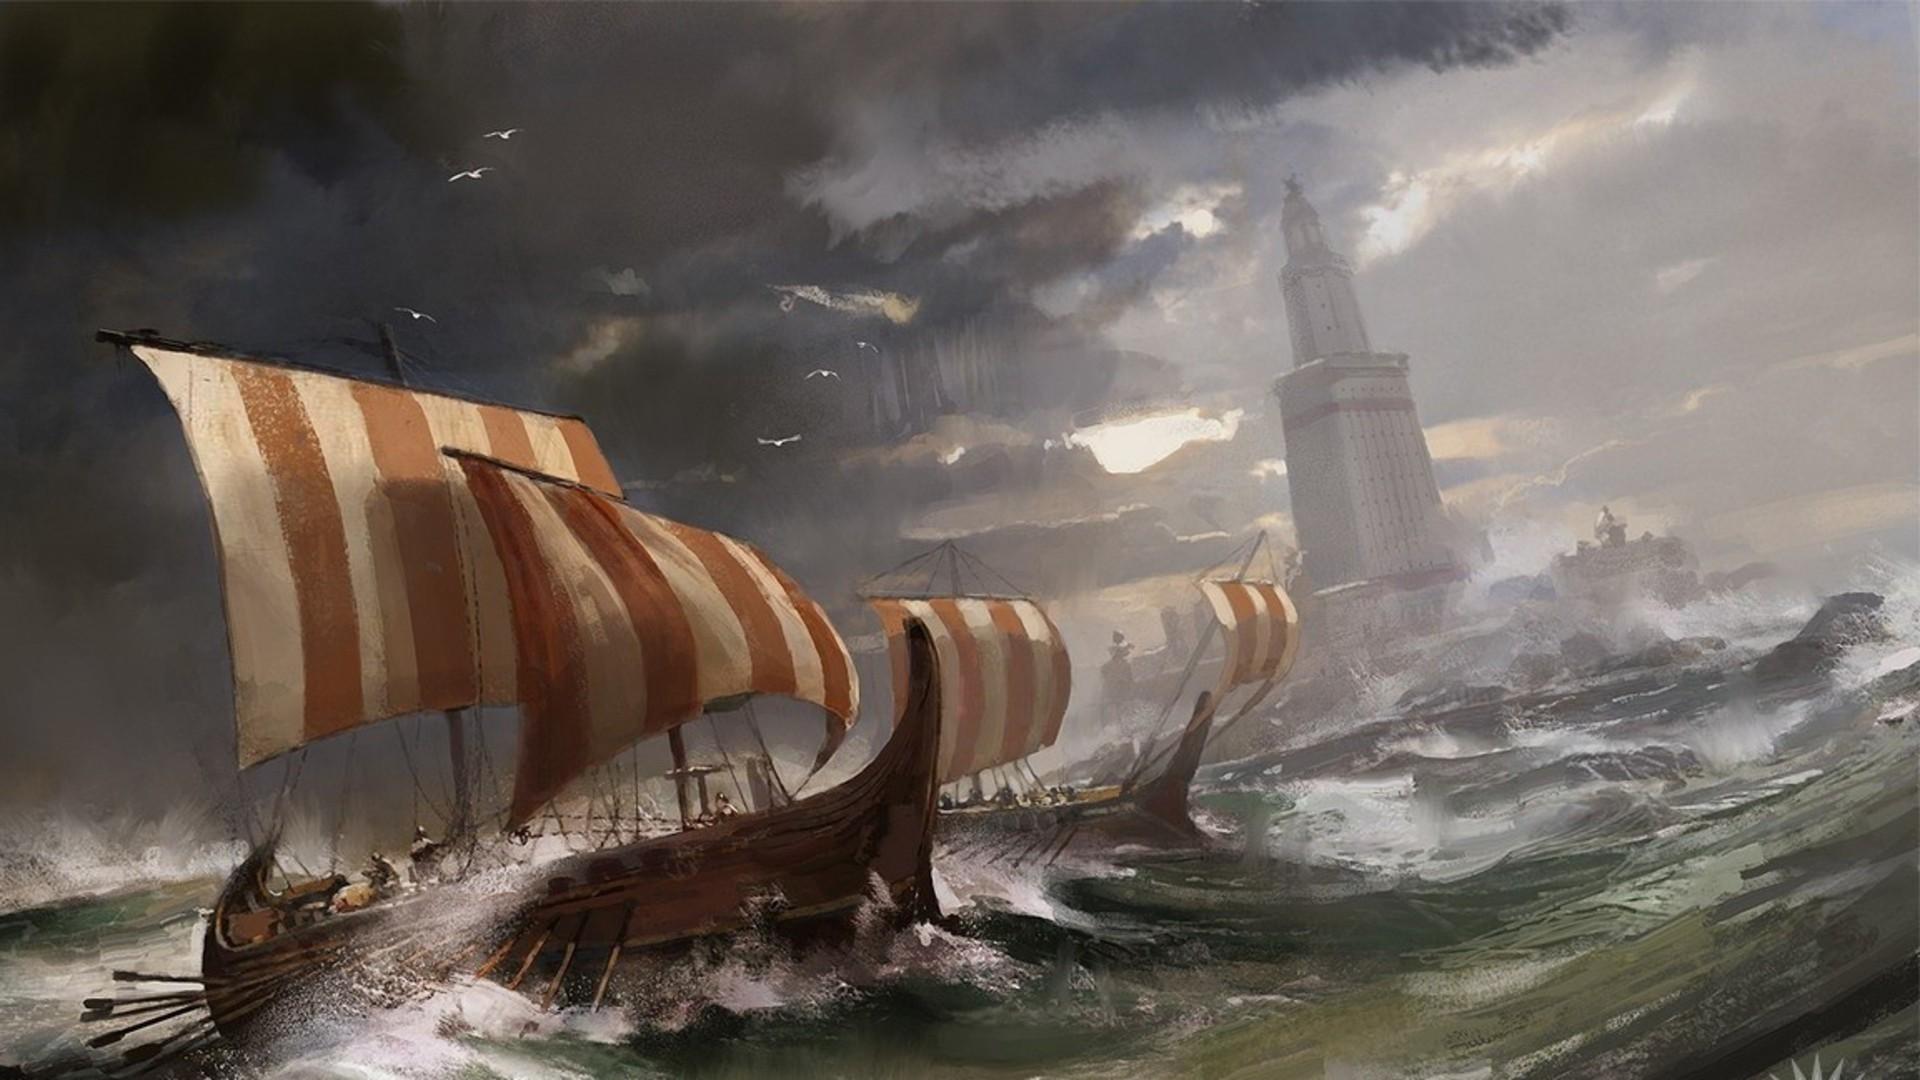 Download px Vikings Wallpapers, Vikings HD Wallpapers for Free |  Desktop-Screens